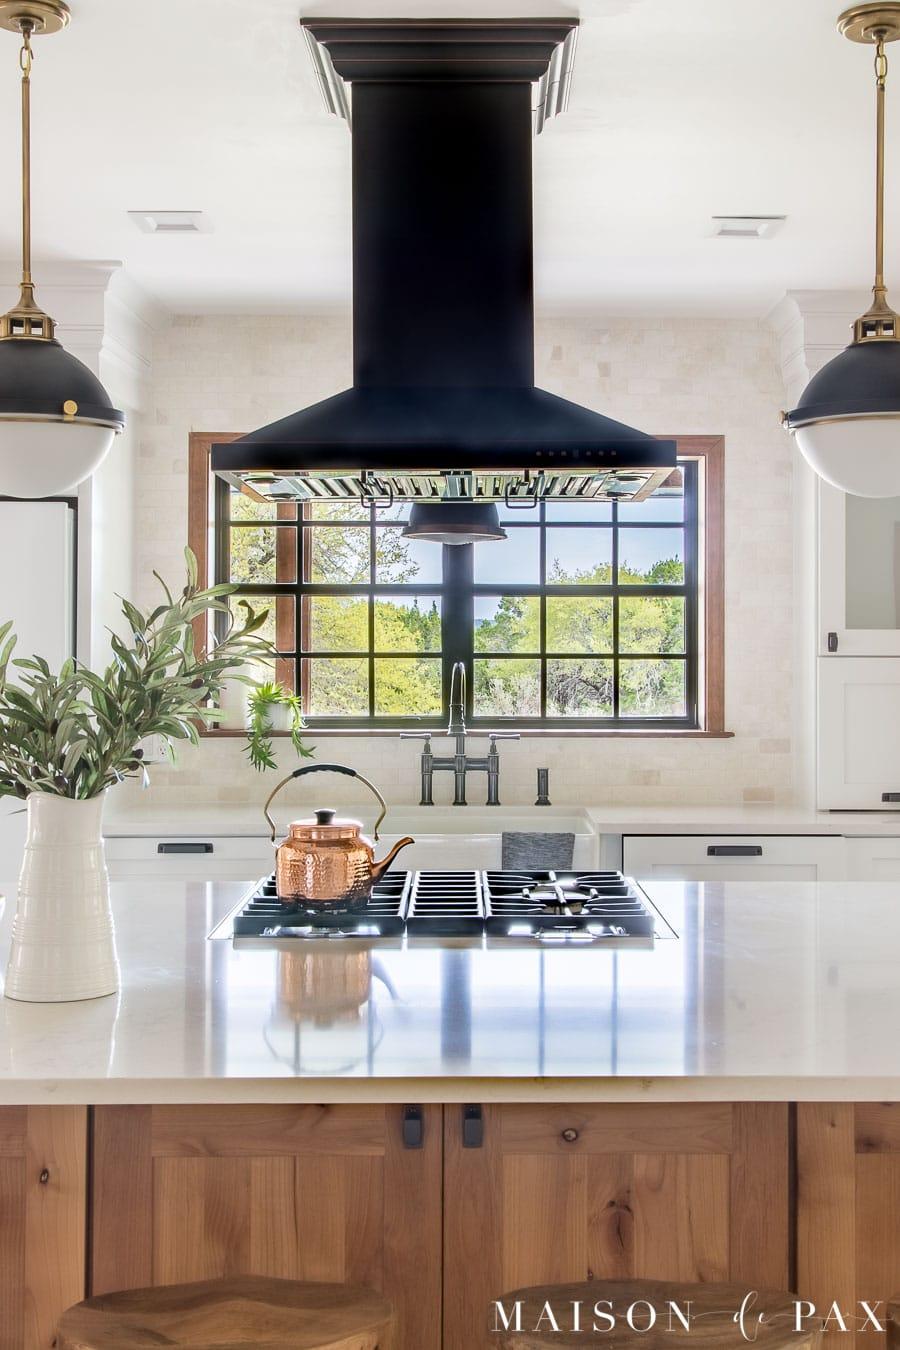 Rustic Modern Farmhouse Kitchen Reveal - Maison de Pax on Rustic Farmhouse Kitchen  id=68386